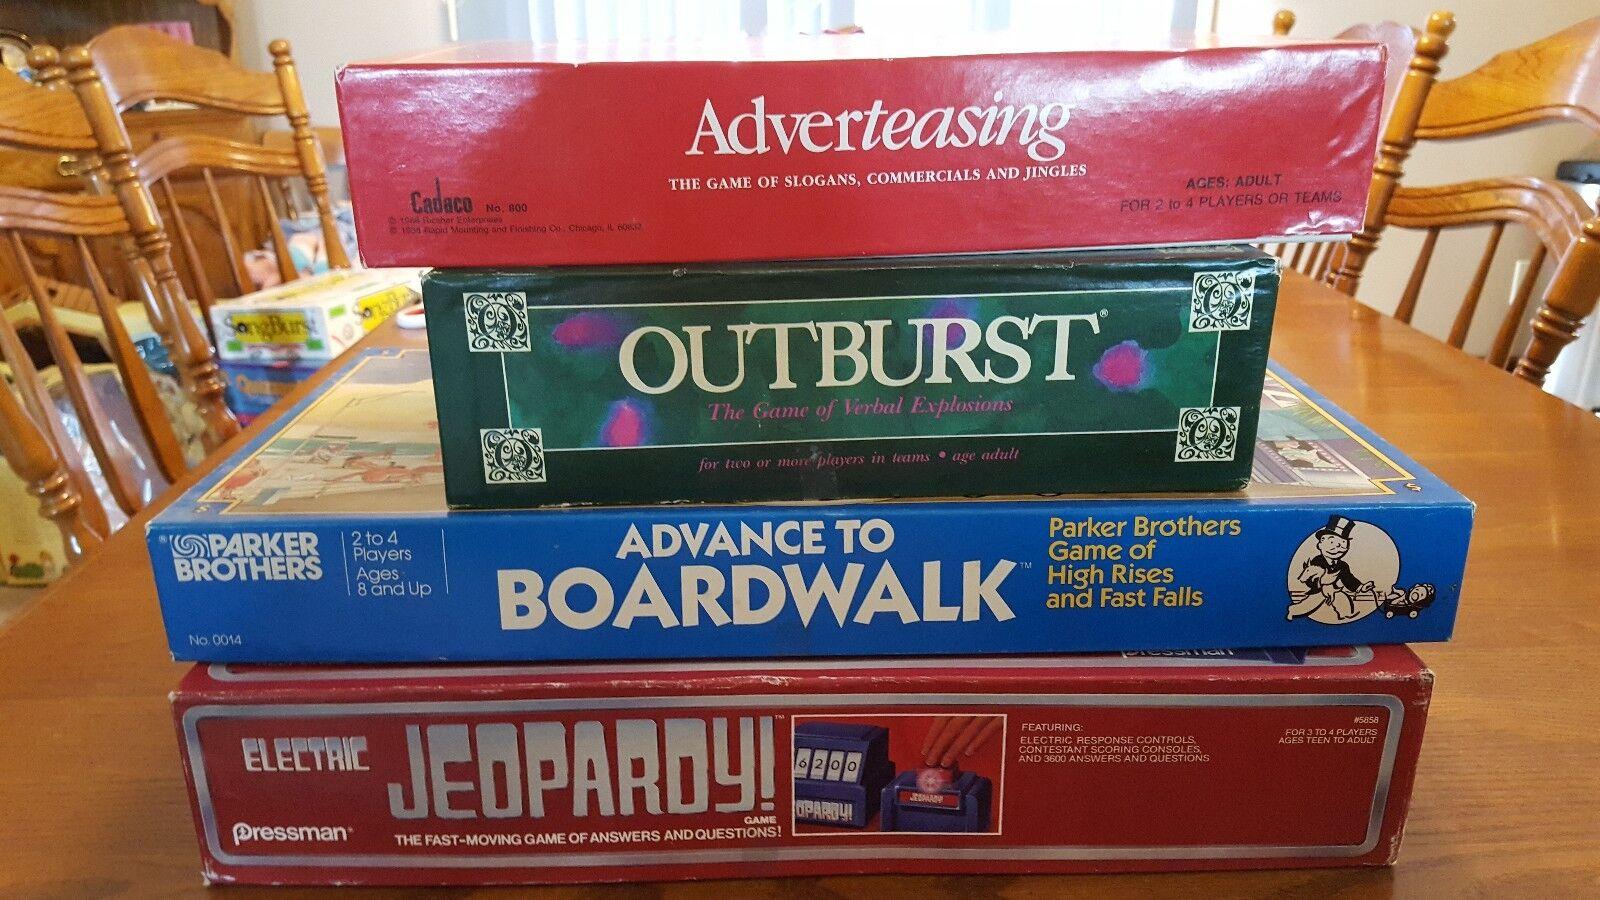 Lot of 4 Vintage games ELECTRONIC JEOPARDY ADVANCE TO BOARDWALK OUTBURST ADgreenE